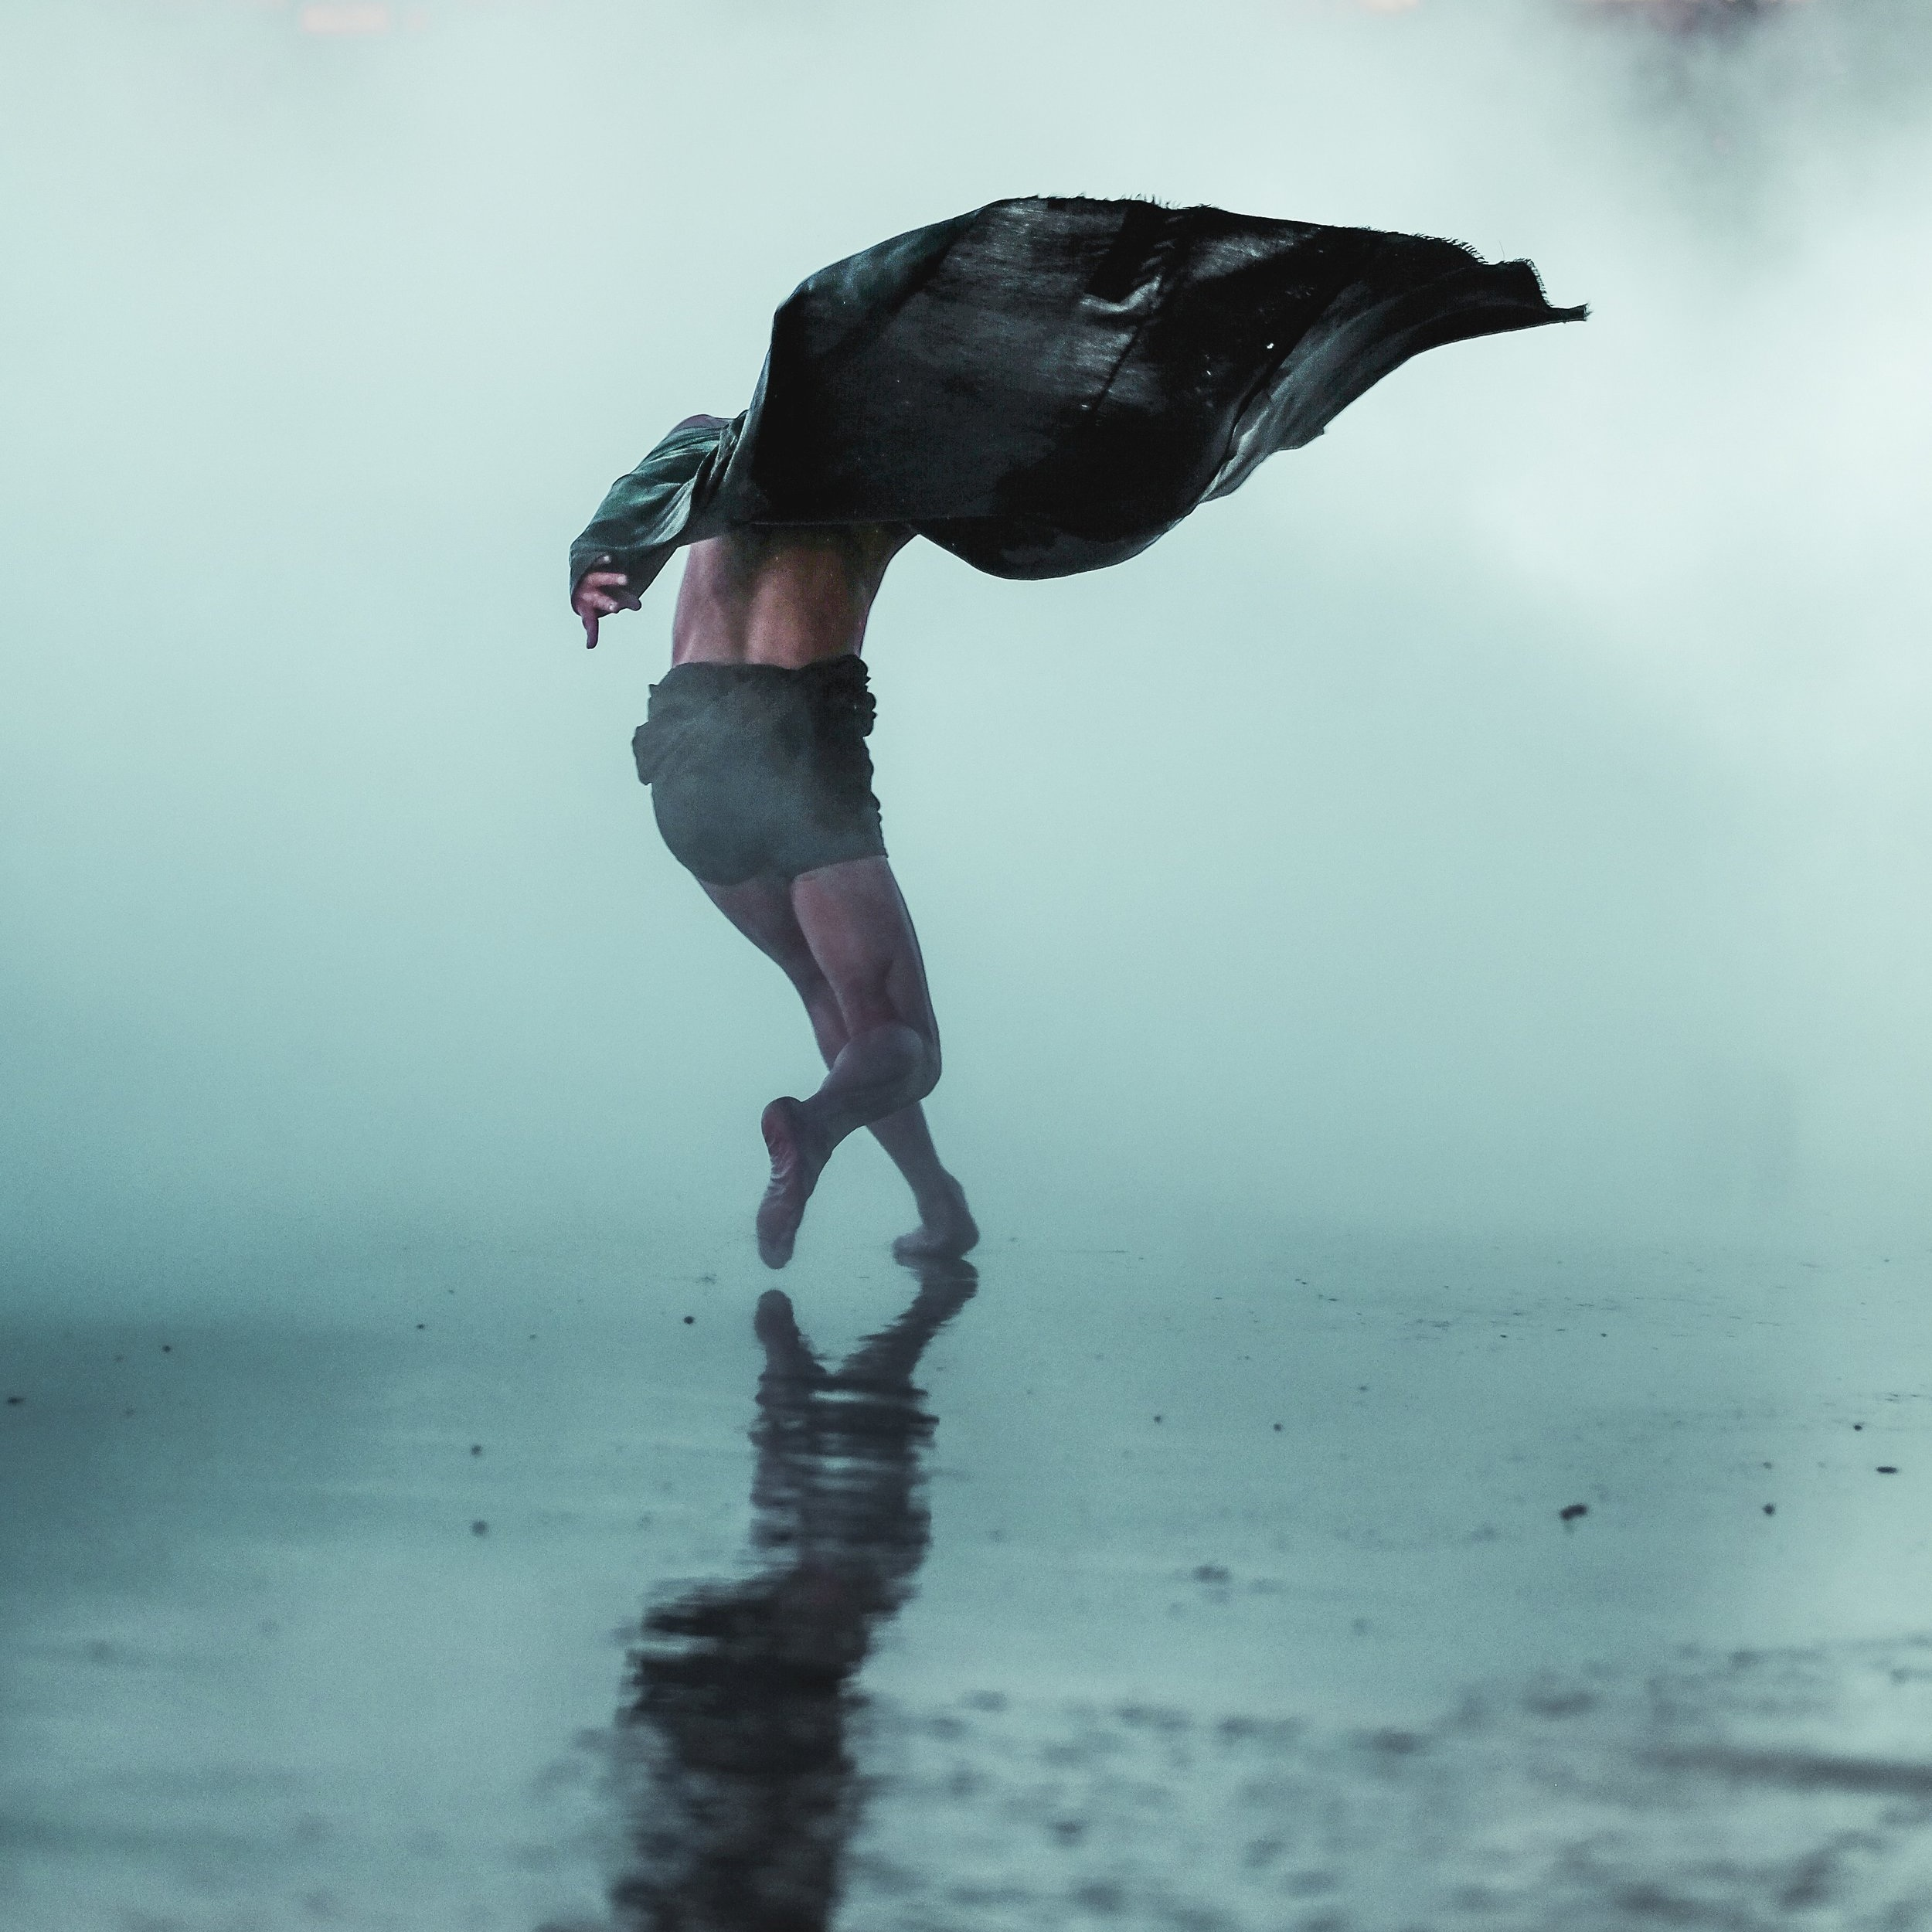 Loving Beyond Boundaries - By Natalia Terfa